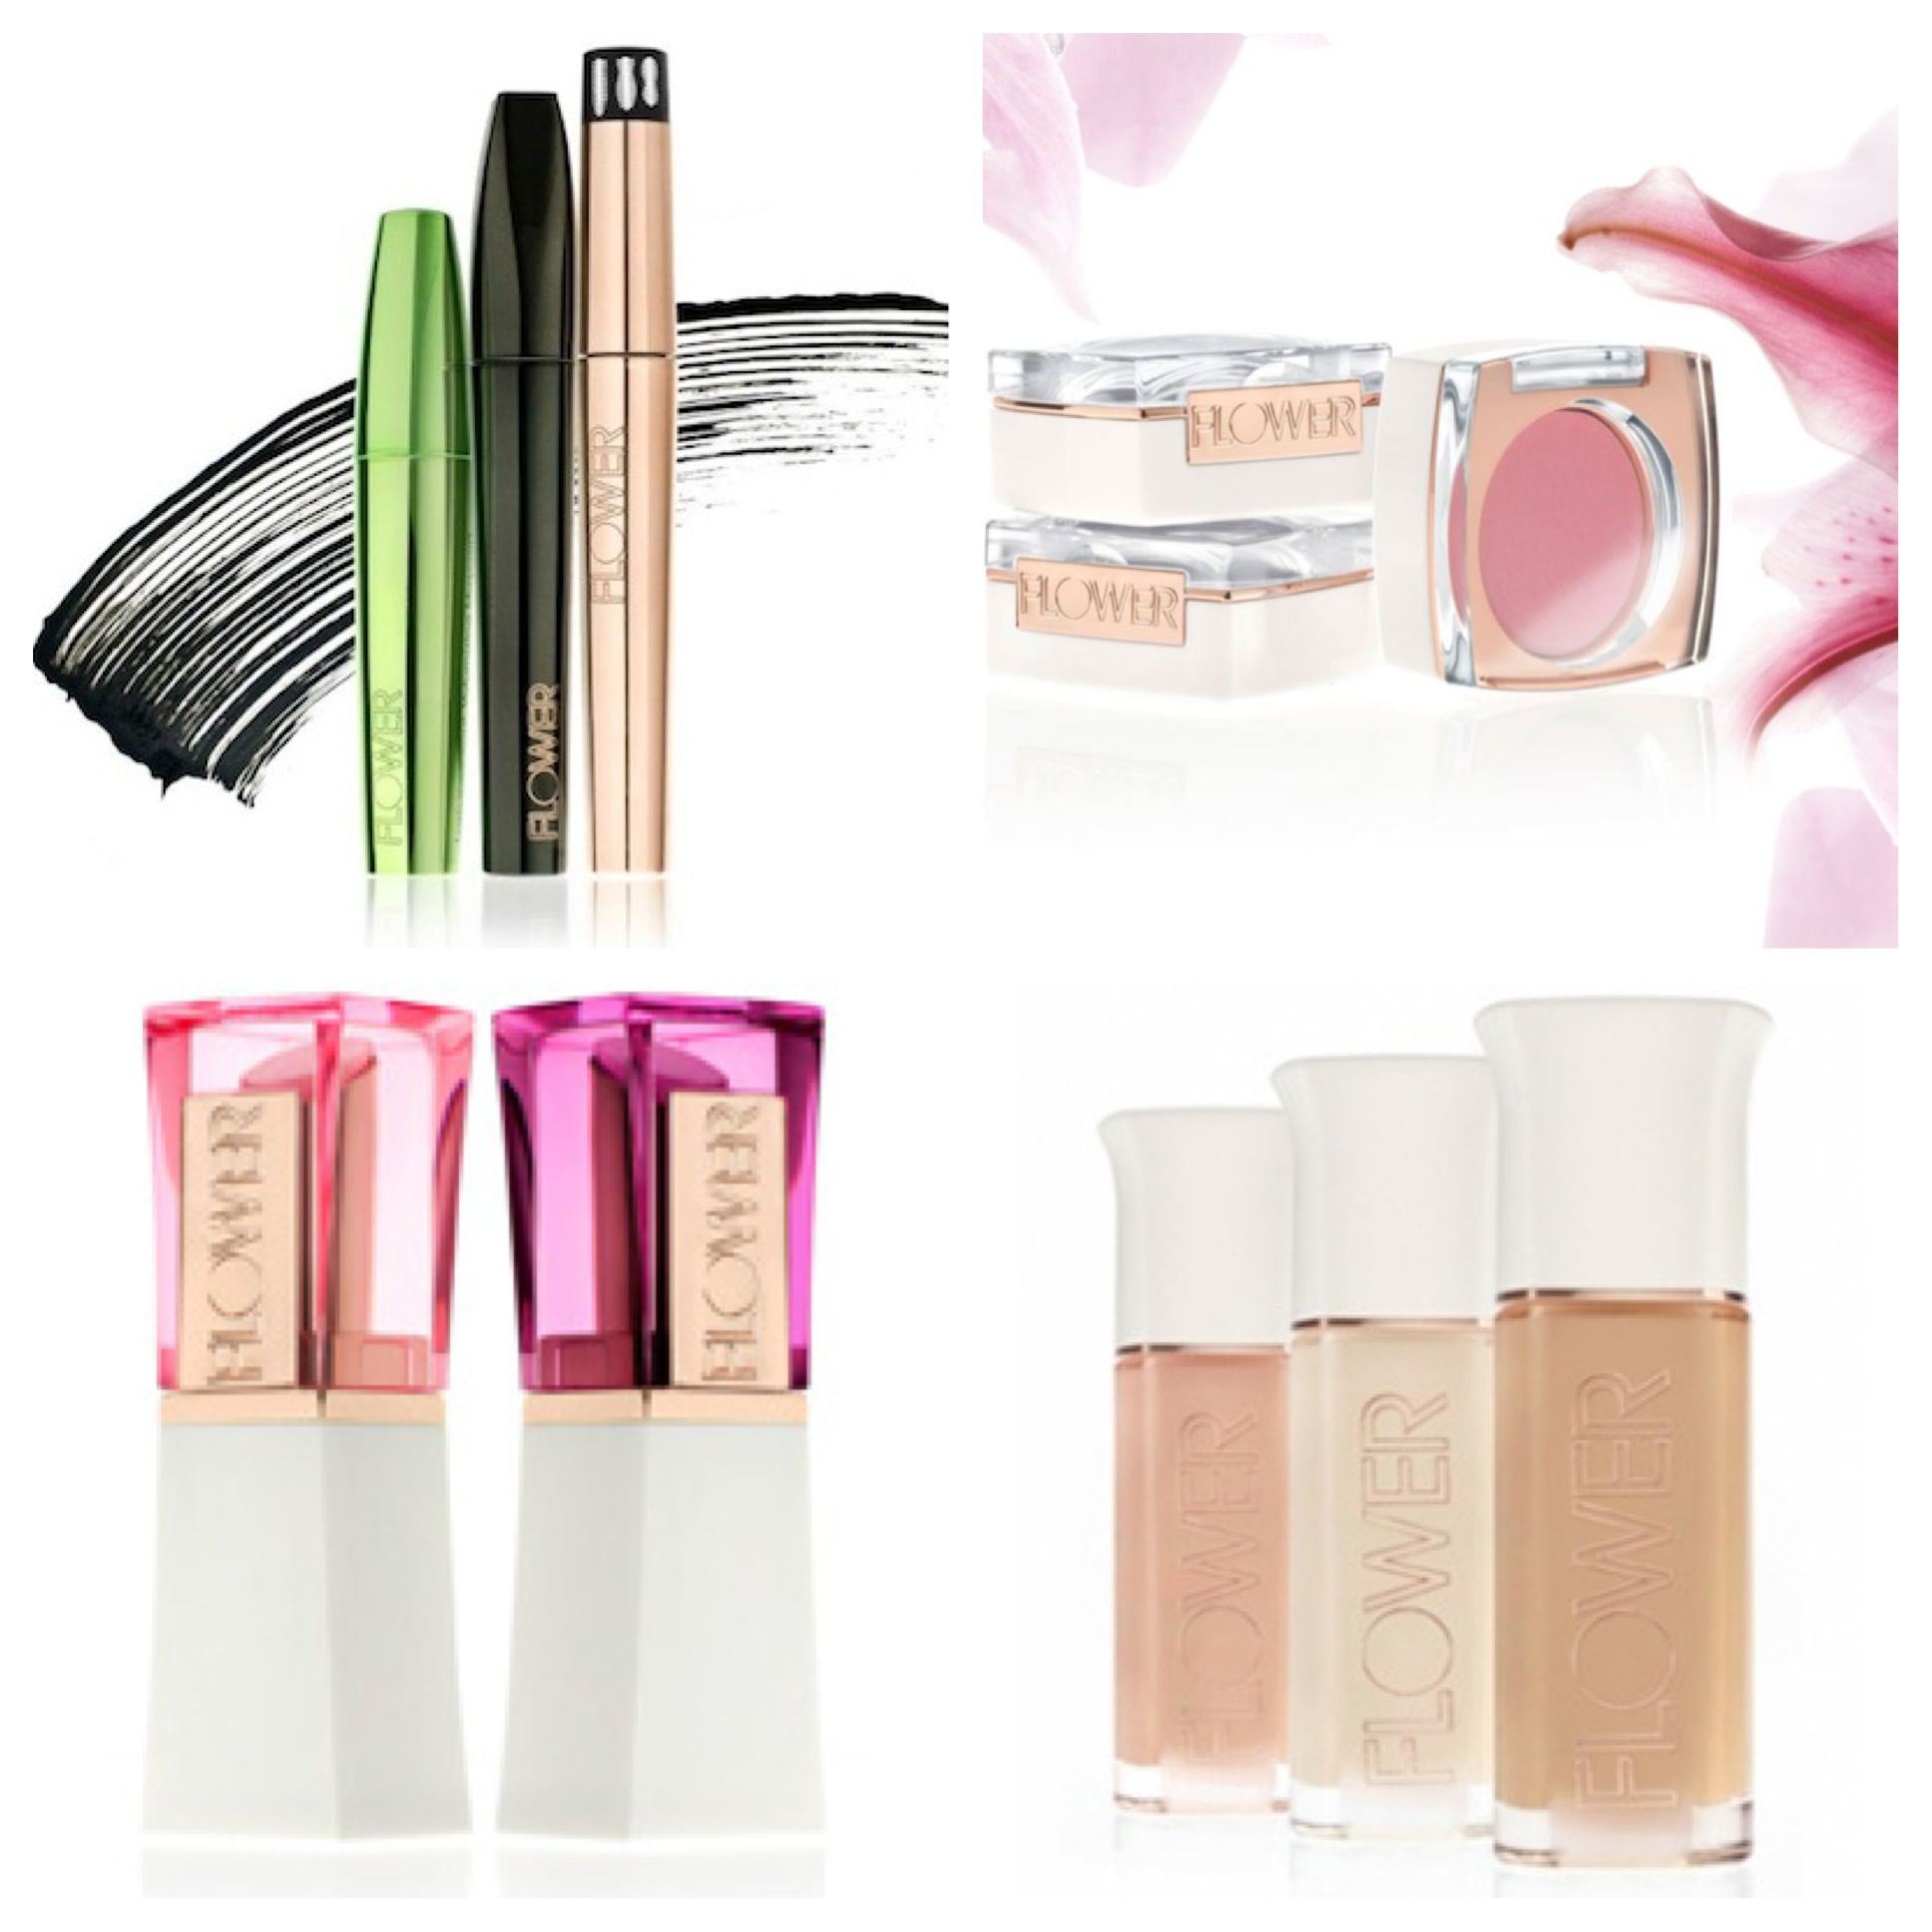 Flower Beauty Makeup & Cosmetics By Drew Barrymore.